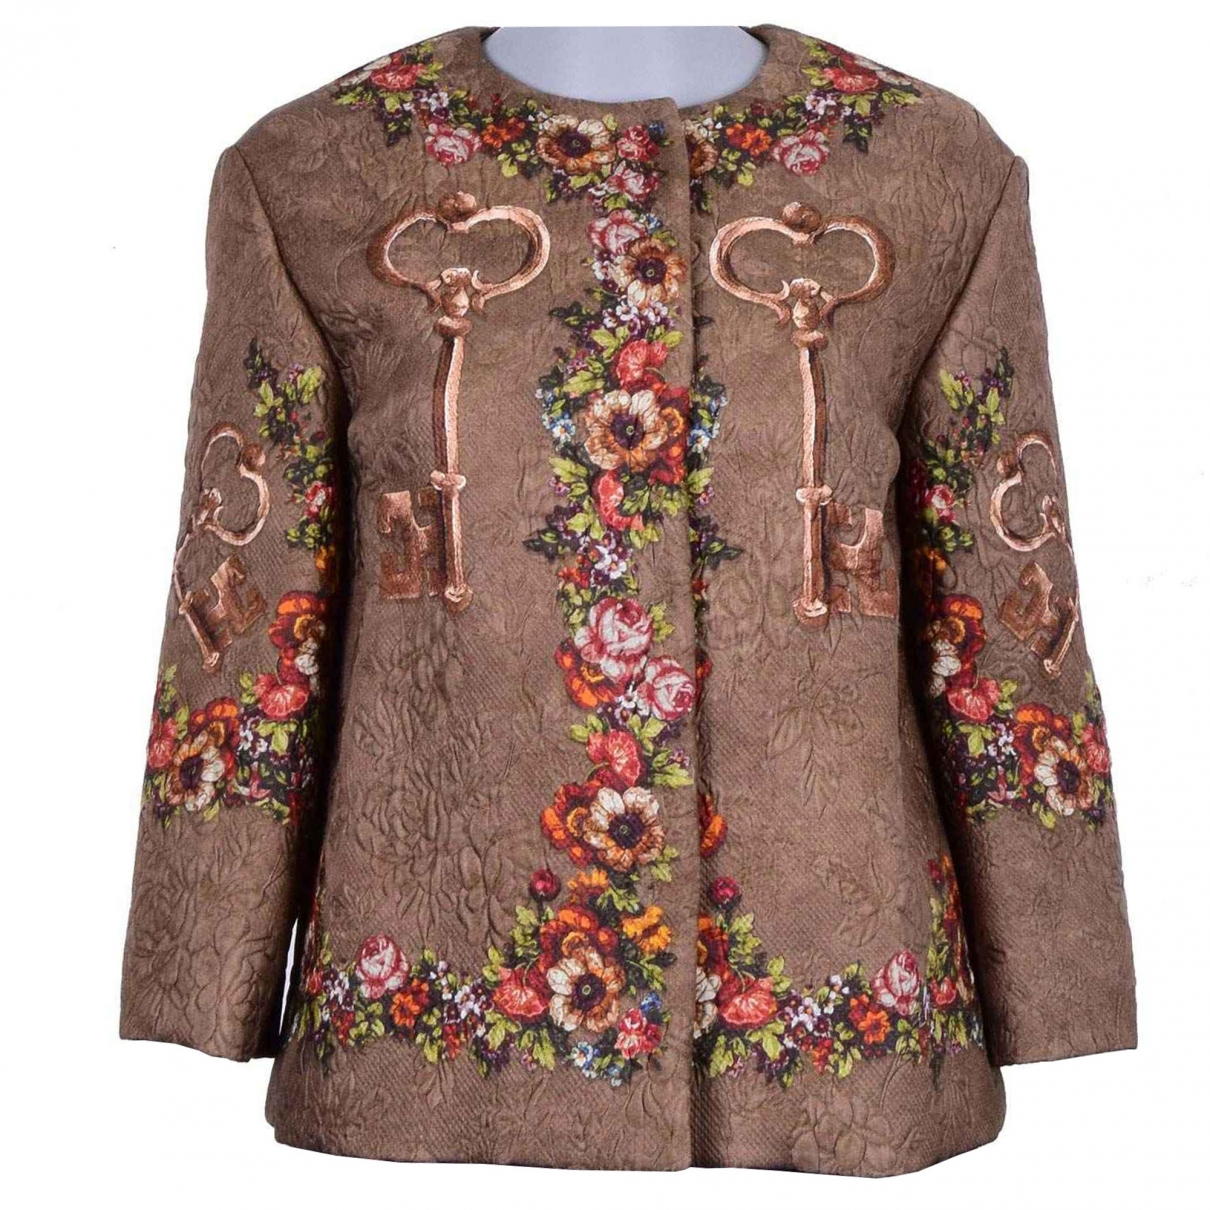 Dolce & Gabbana \N Brown jacket for Women 38 IT